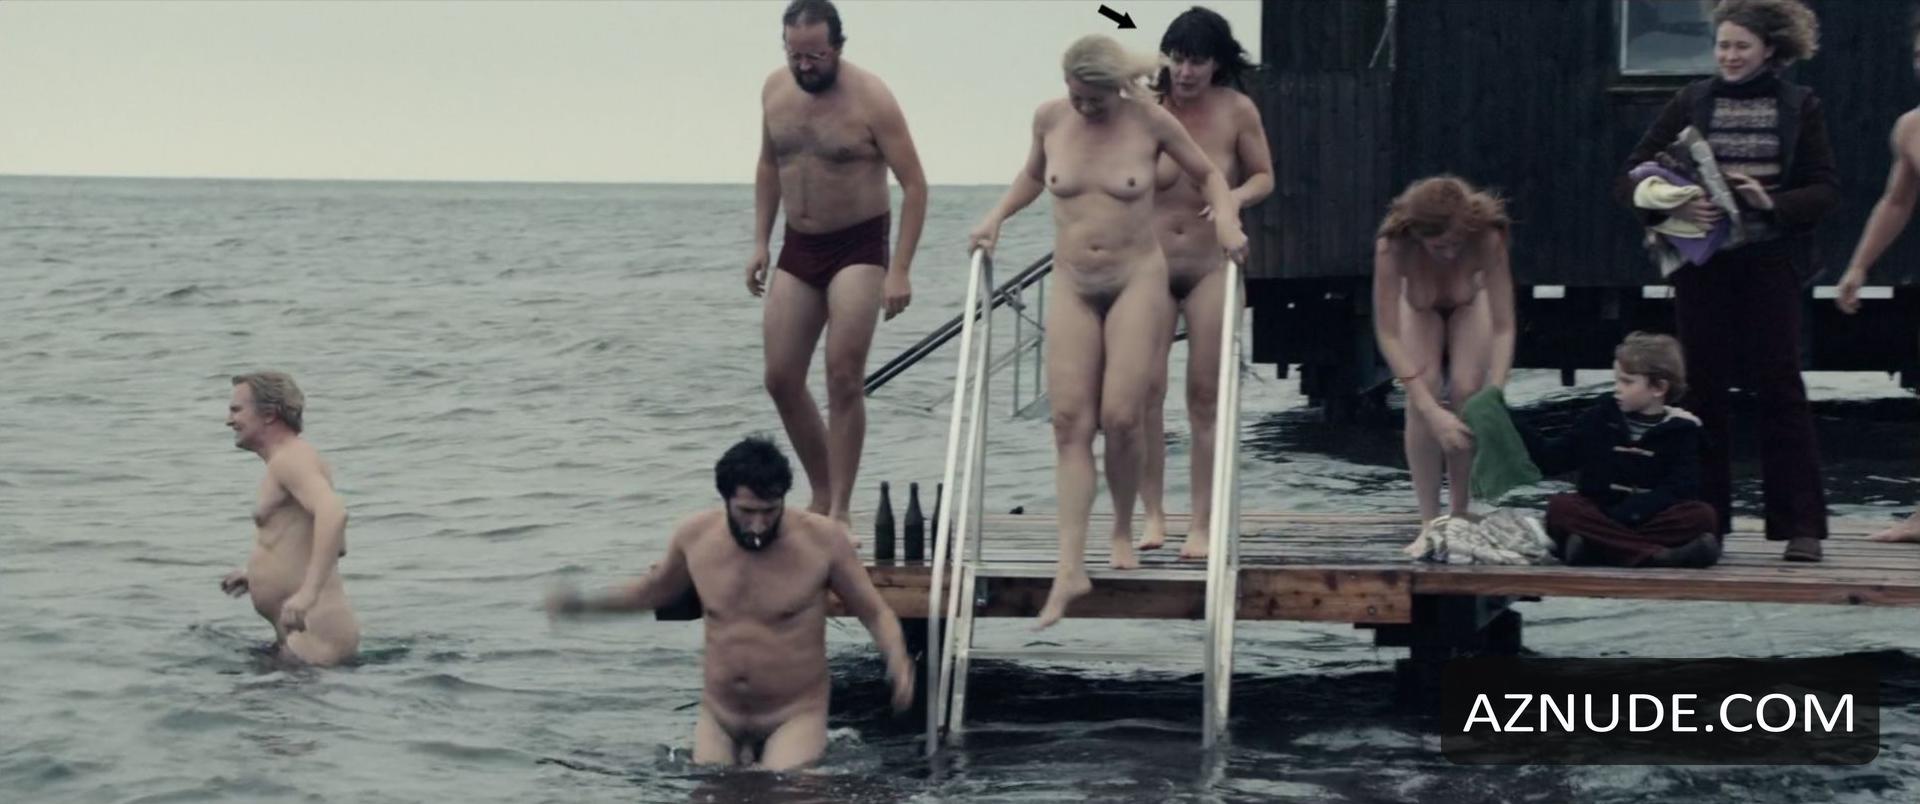 The Commune Nude Scenes - Aznude-8723